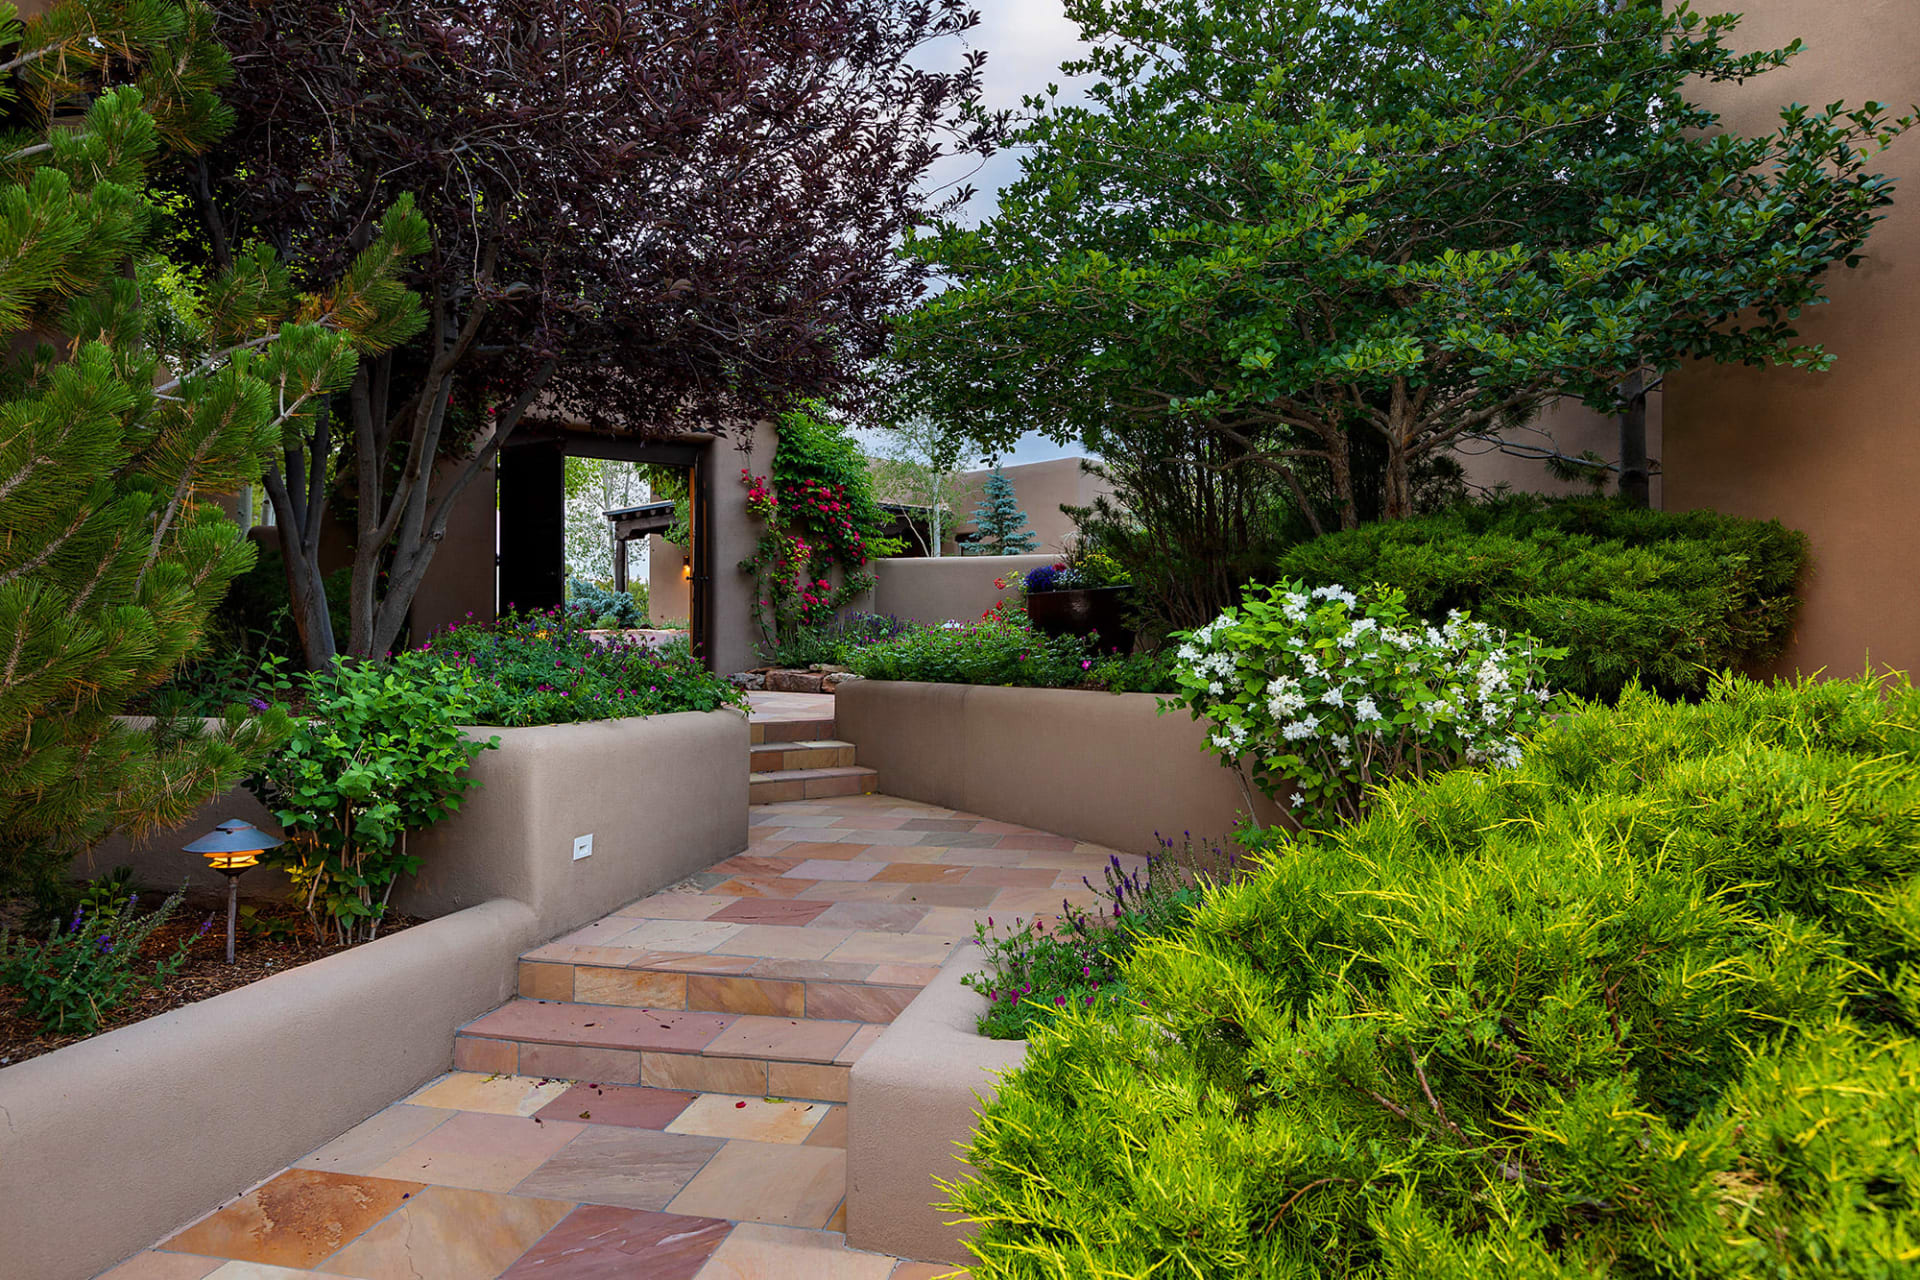 Santa Fe Home Appeal image